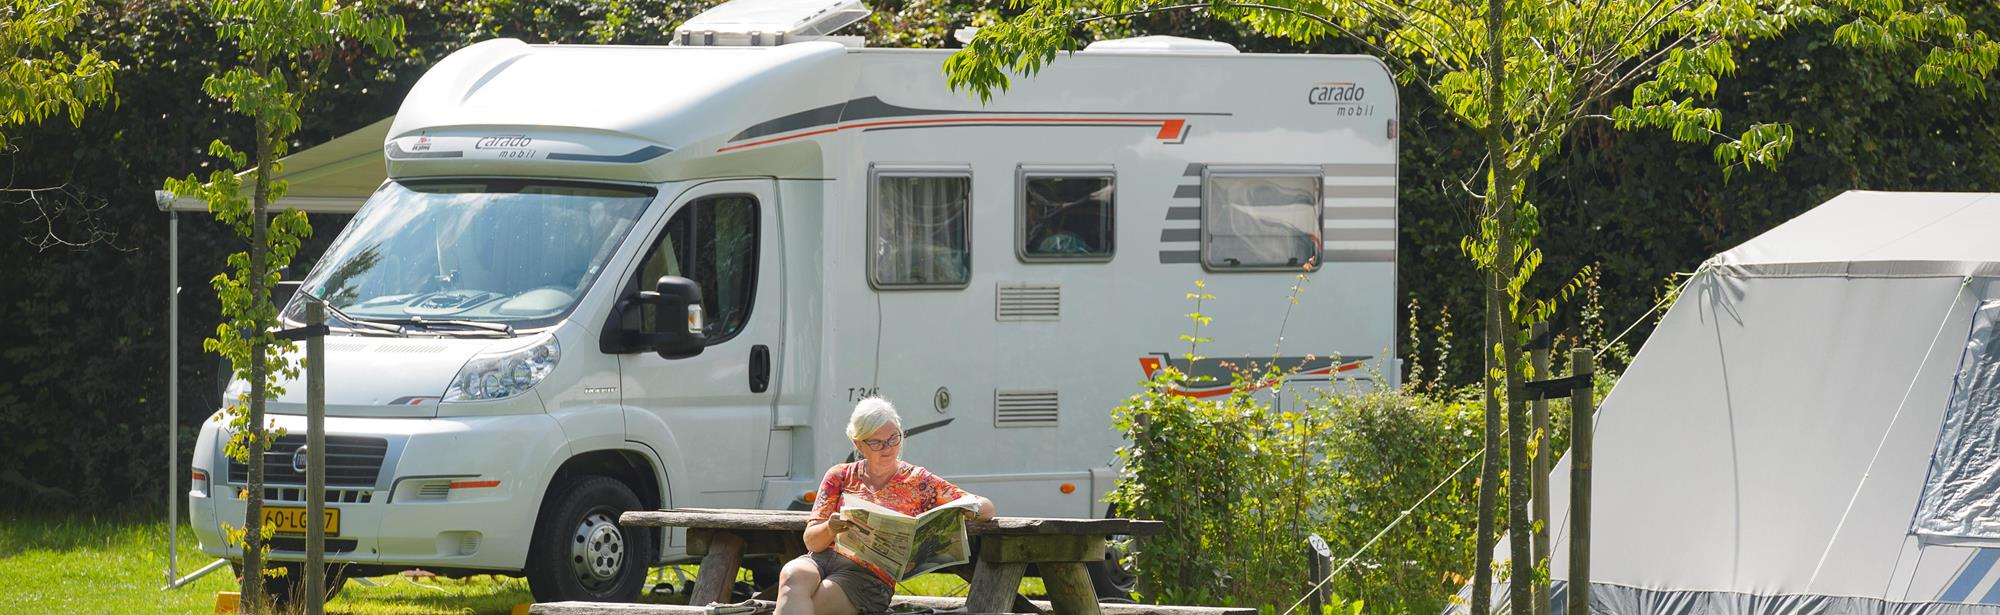 Camping Mareveld